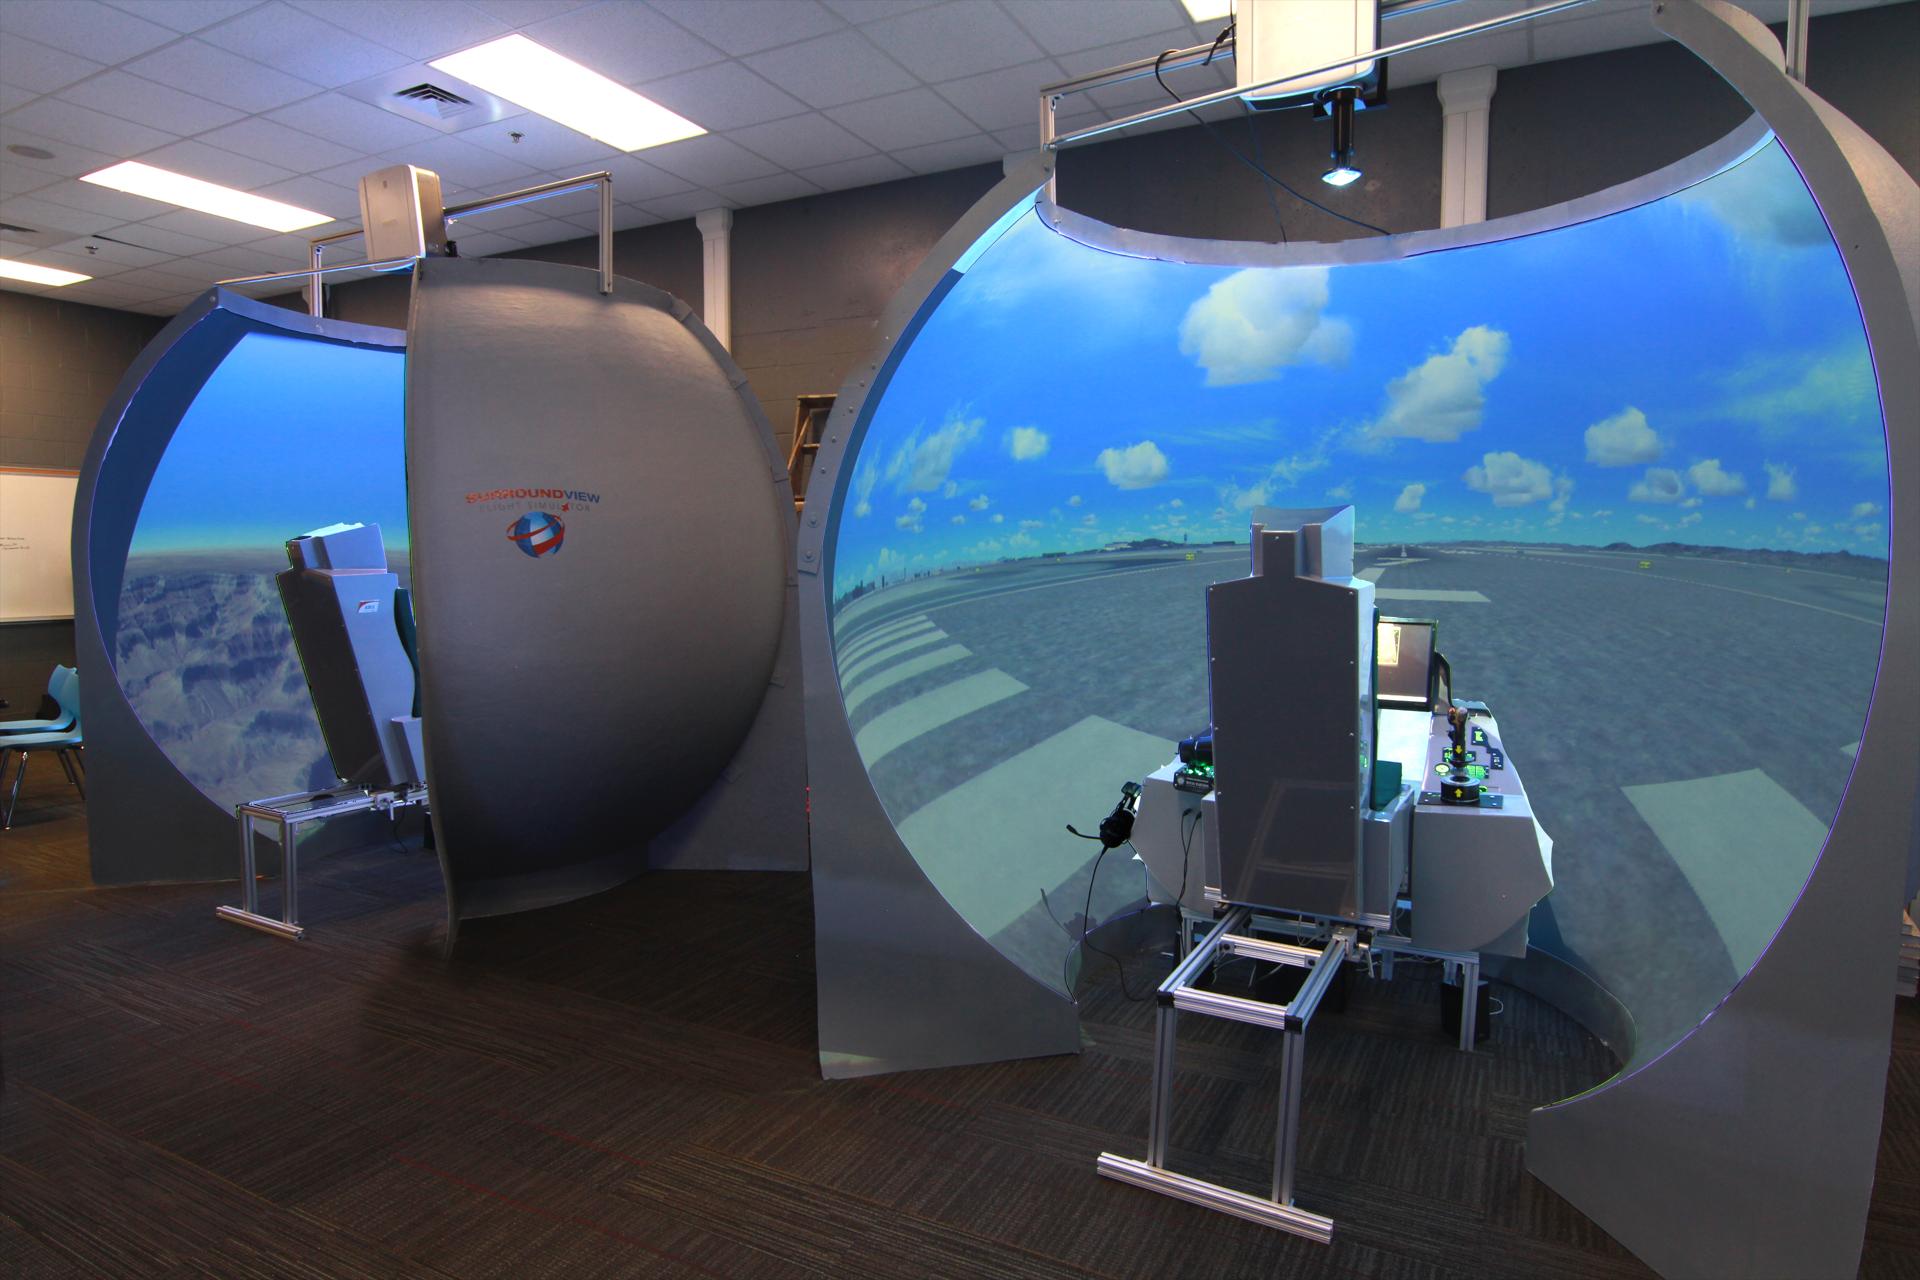 Surround View Flight Simulators